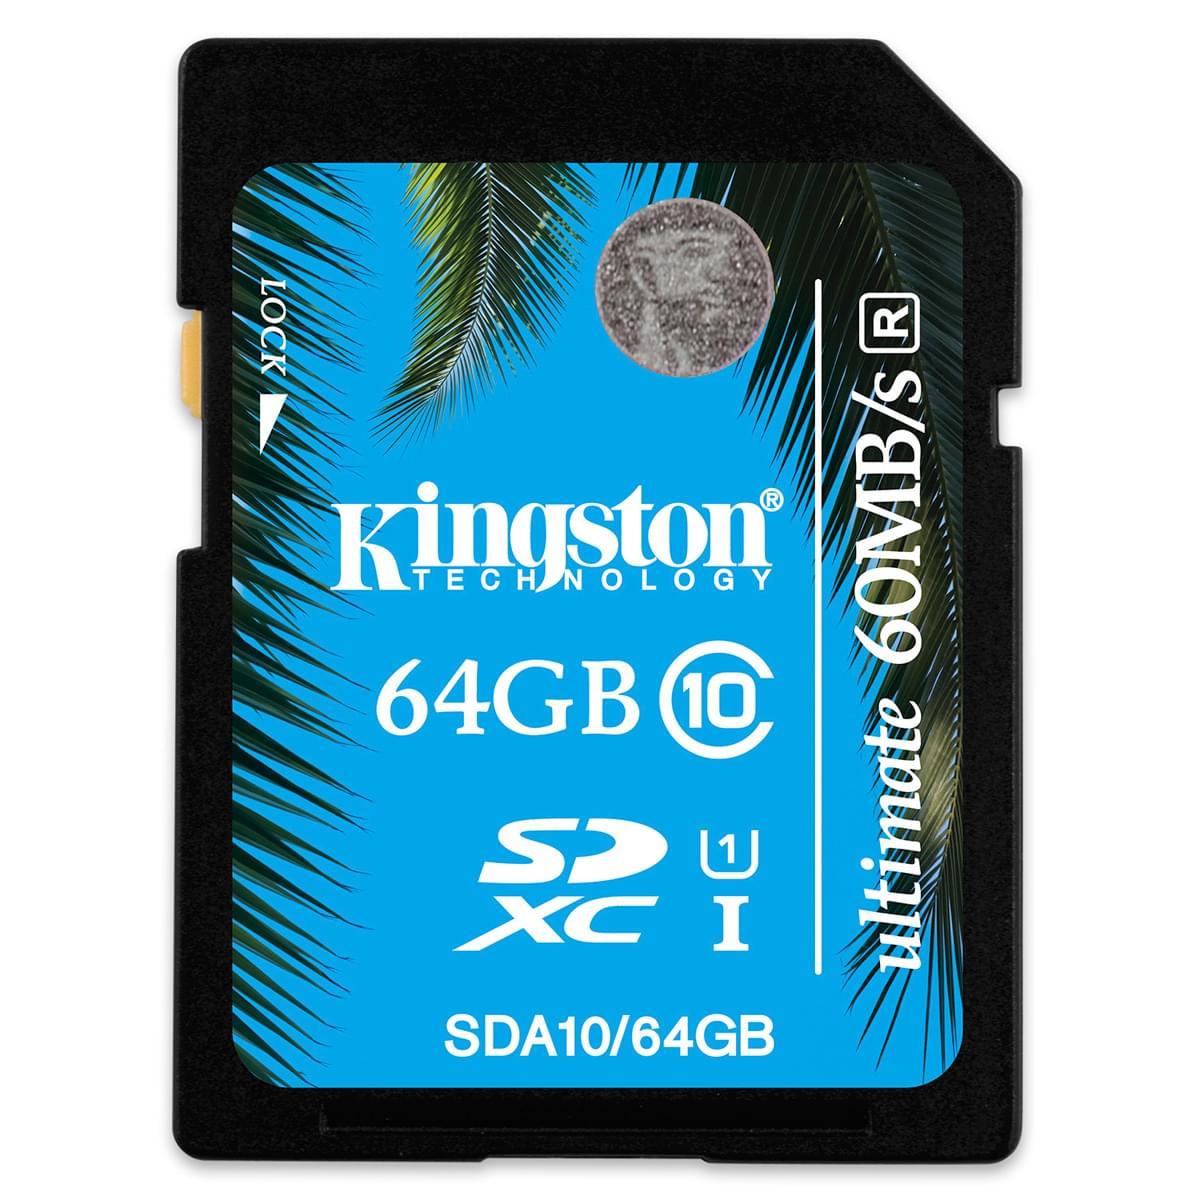 Kingston SDXC 64Go Class 10 SDA10/64GB (SDA10/64GB) - Achat / Vente Carte mémoire sur Cybertek.fr - 0